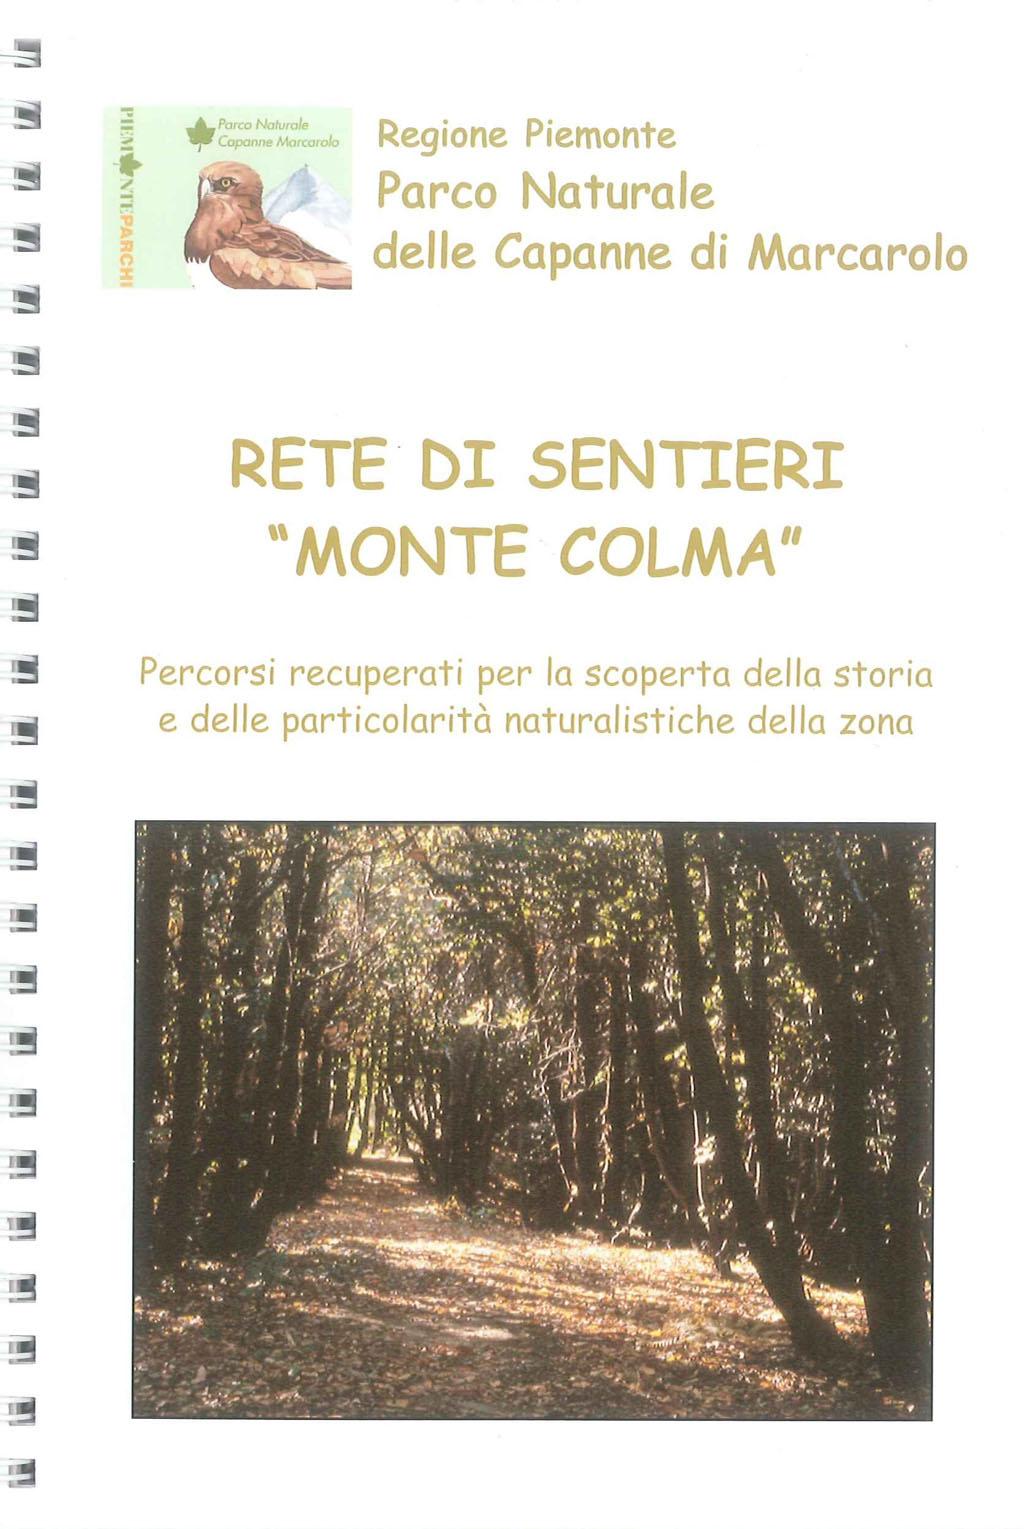 Guida sentieri Monte Colma